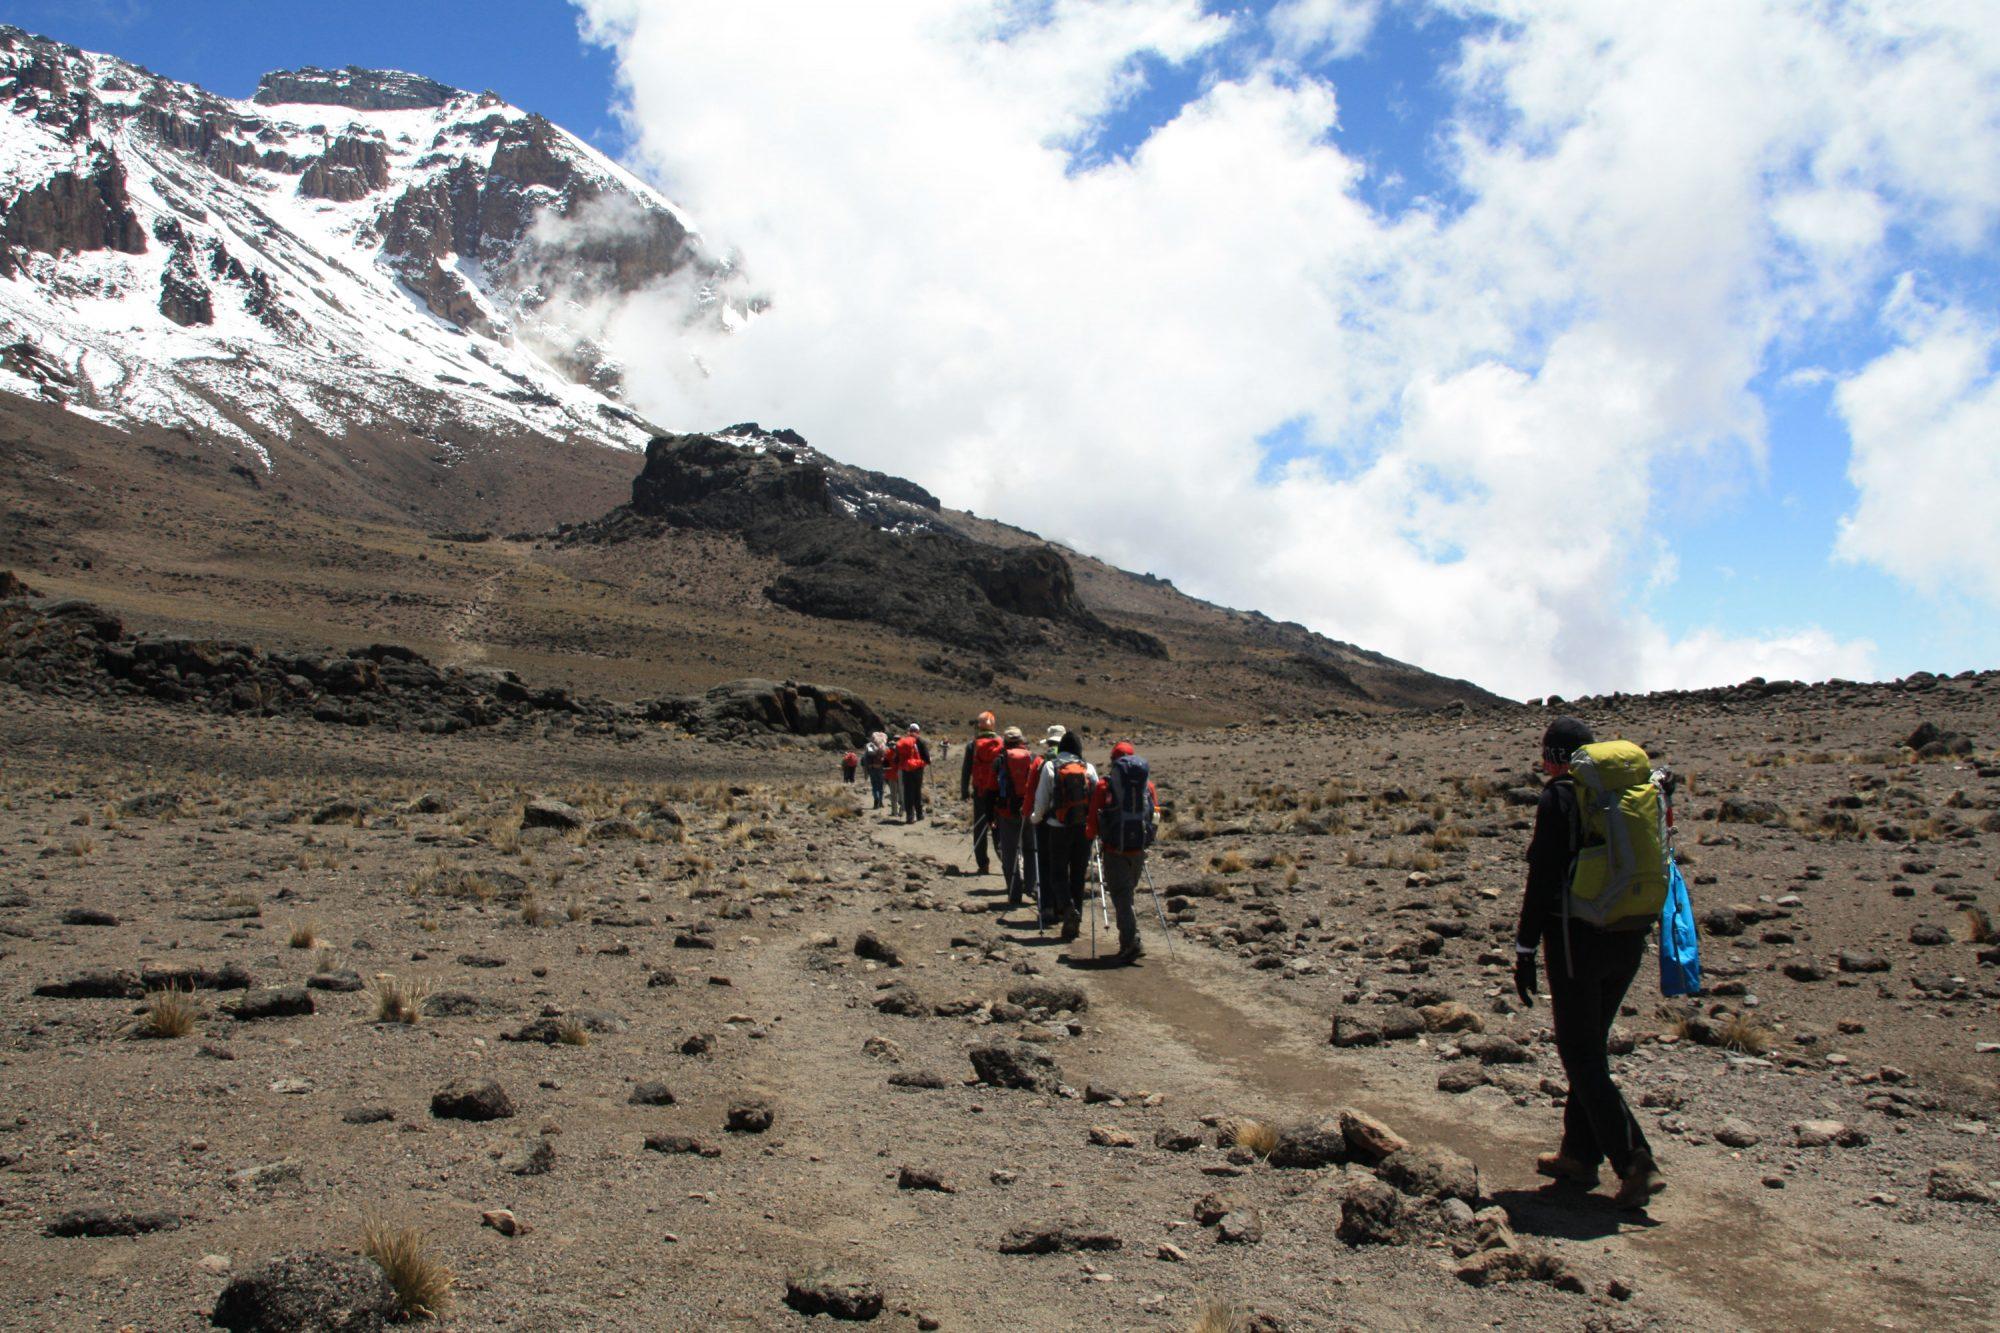 Vulkanlandschaft, Kilimandscharo, Kilimandscharo besteigen, Tansania, Afrika, Kilimandscharo Tour, Erfahrungsbericht, Machame Route